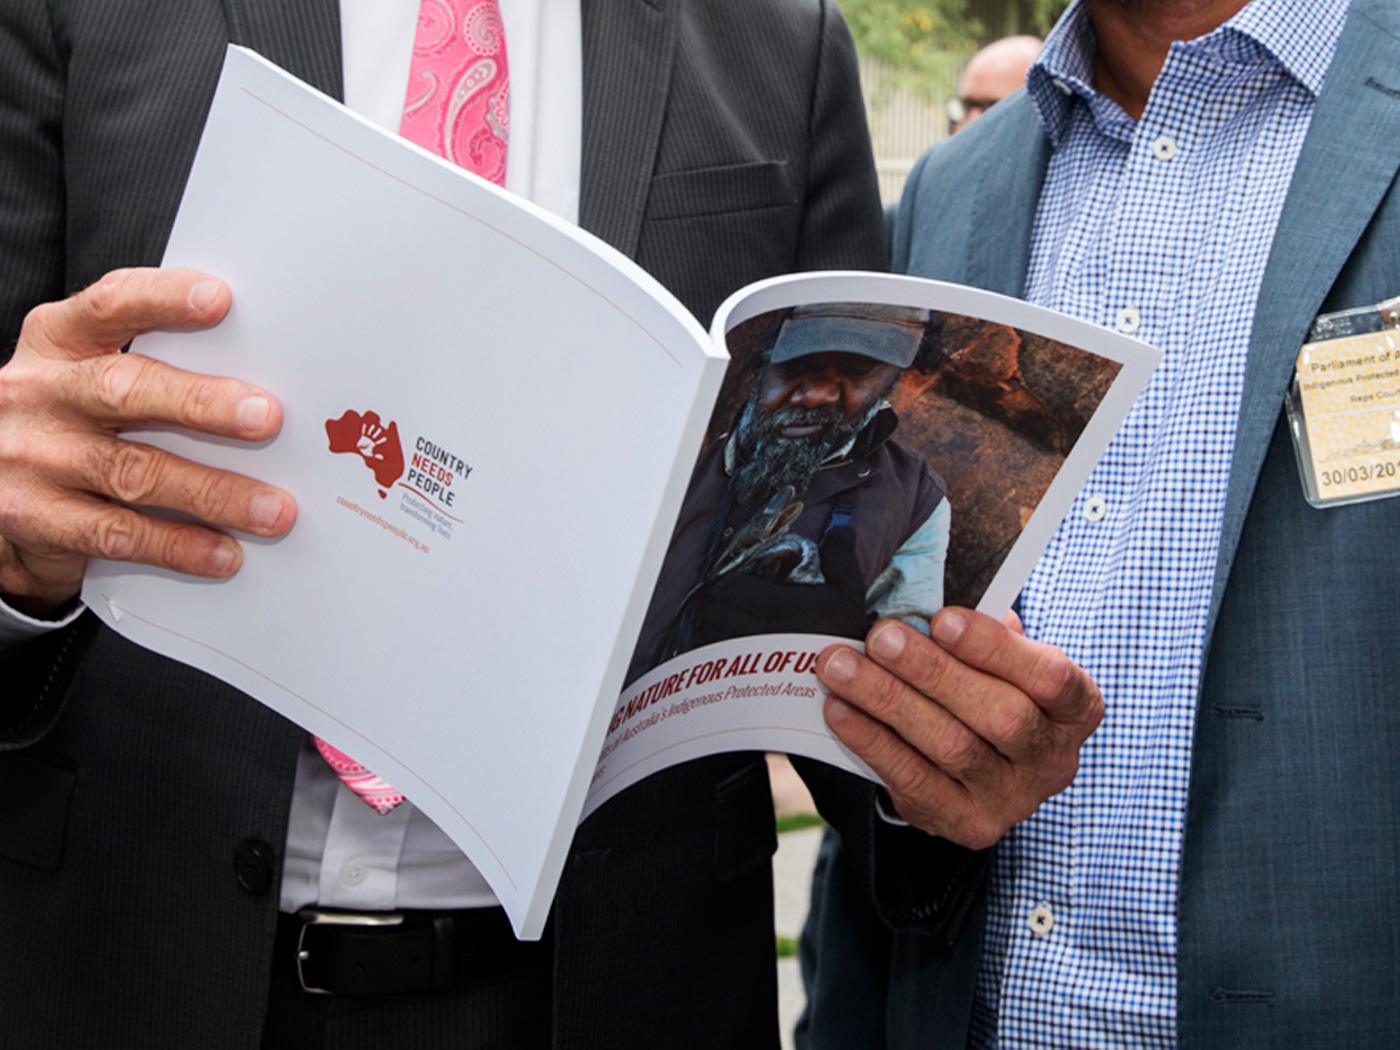 Parliament Launch Report